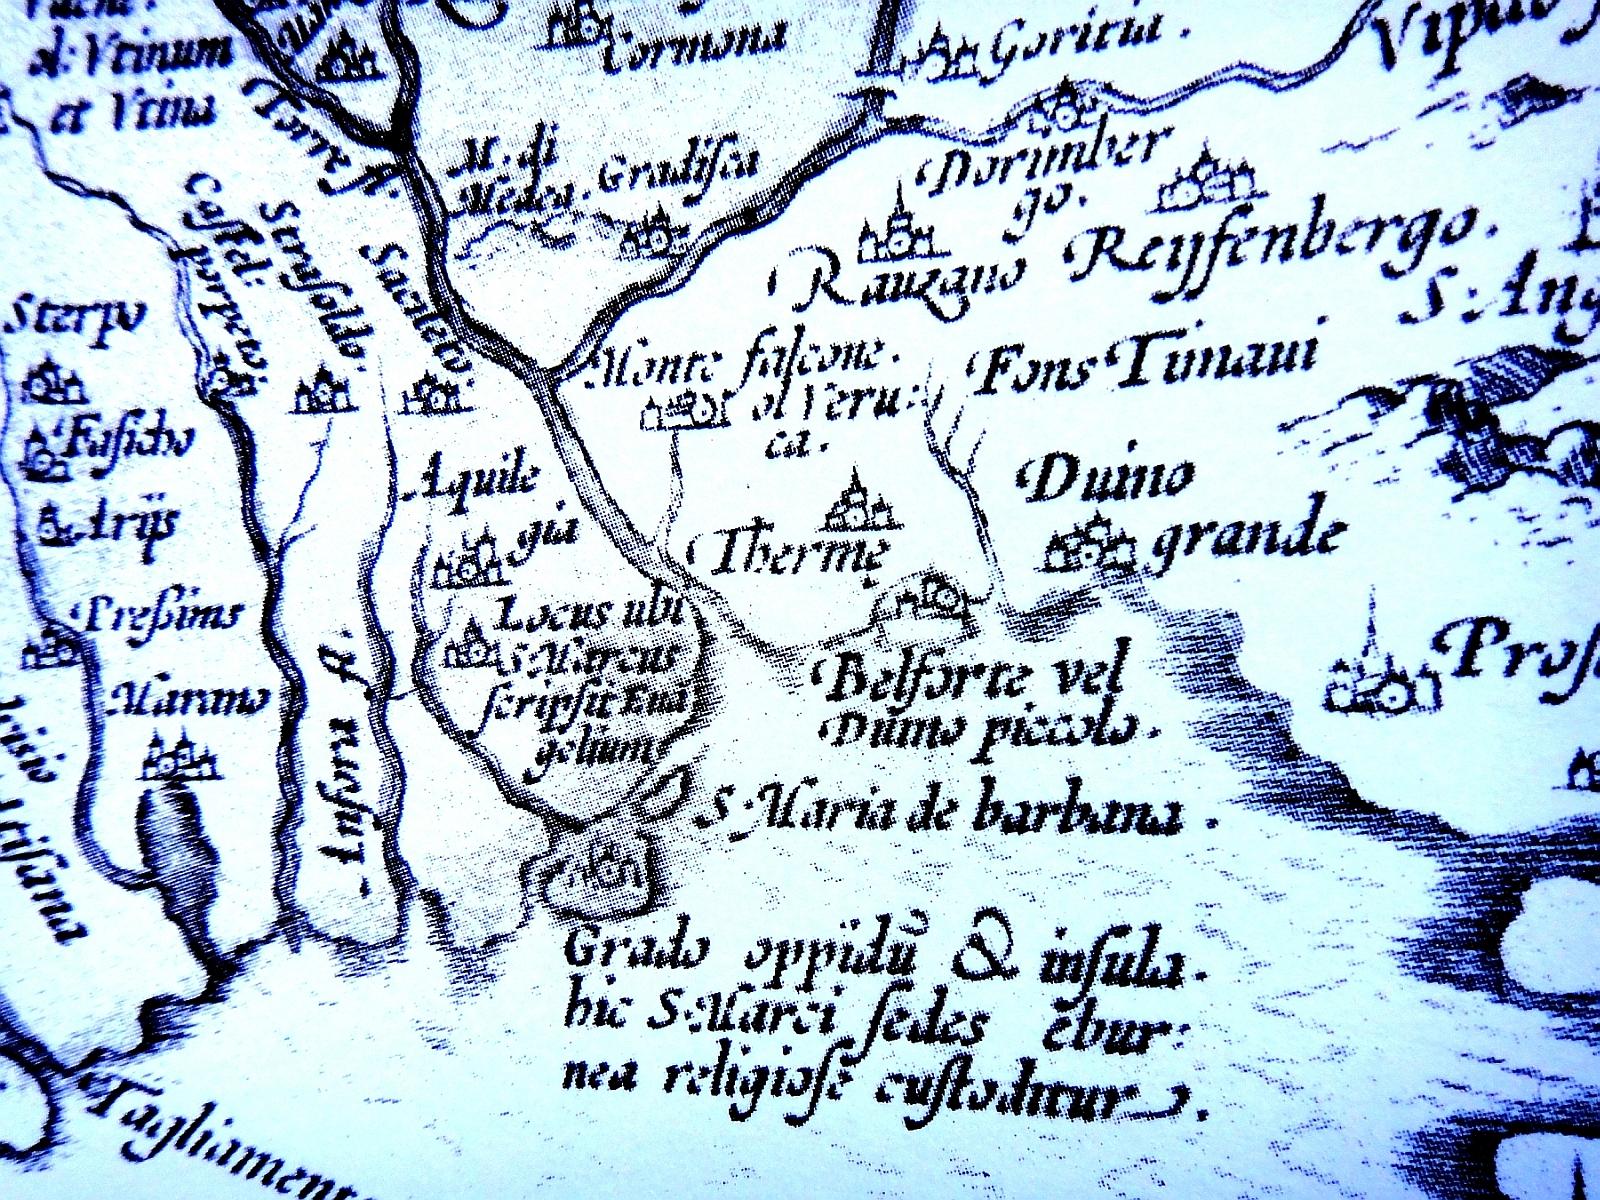 lalto Adriatico; laguna di Grado; die Lagune von Grado; Friuli Venezia Giulia;